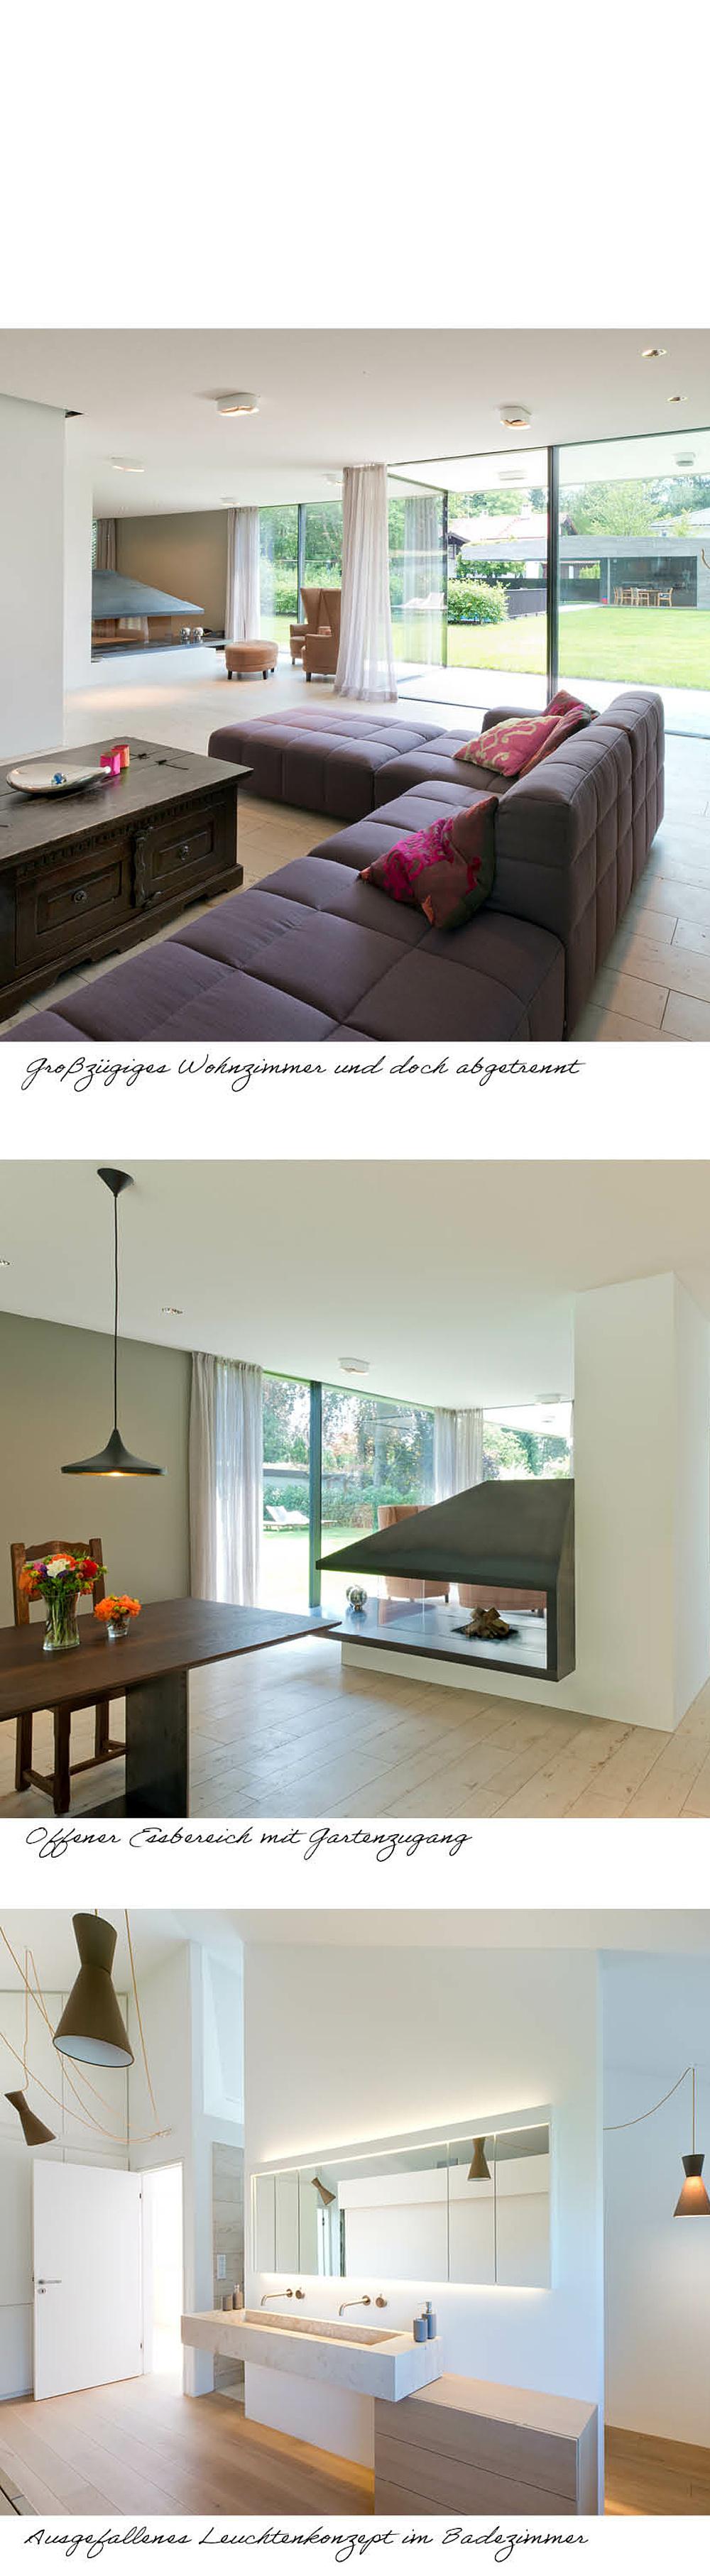 Tipps zur Wohnraumbeleuchtung